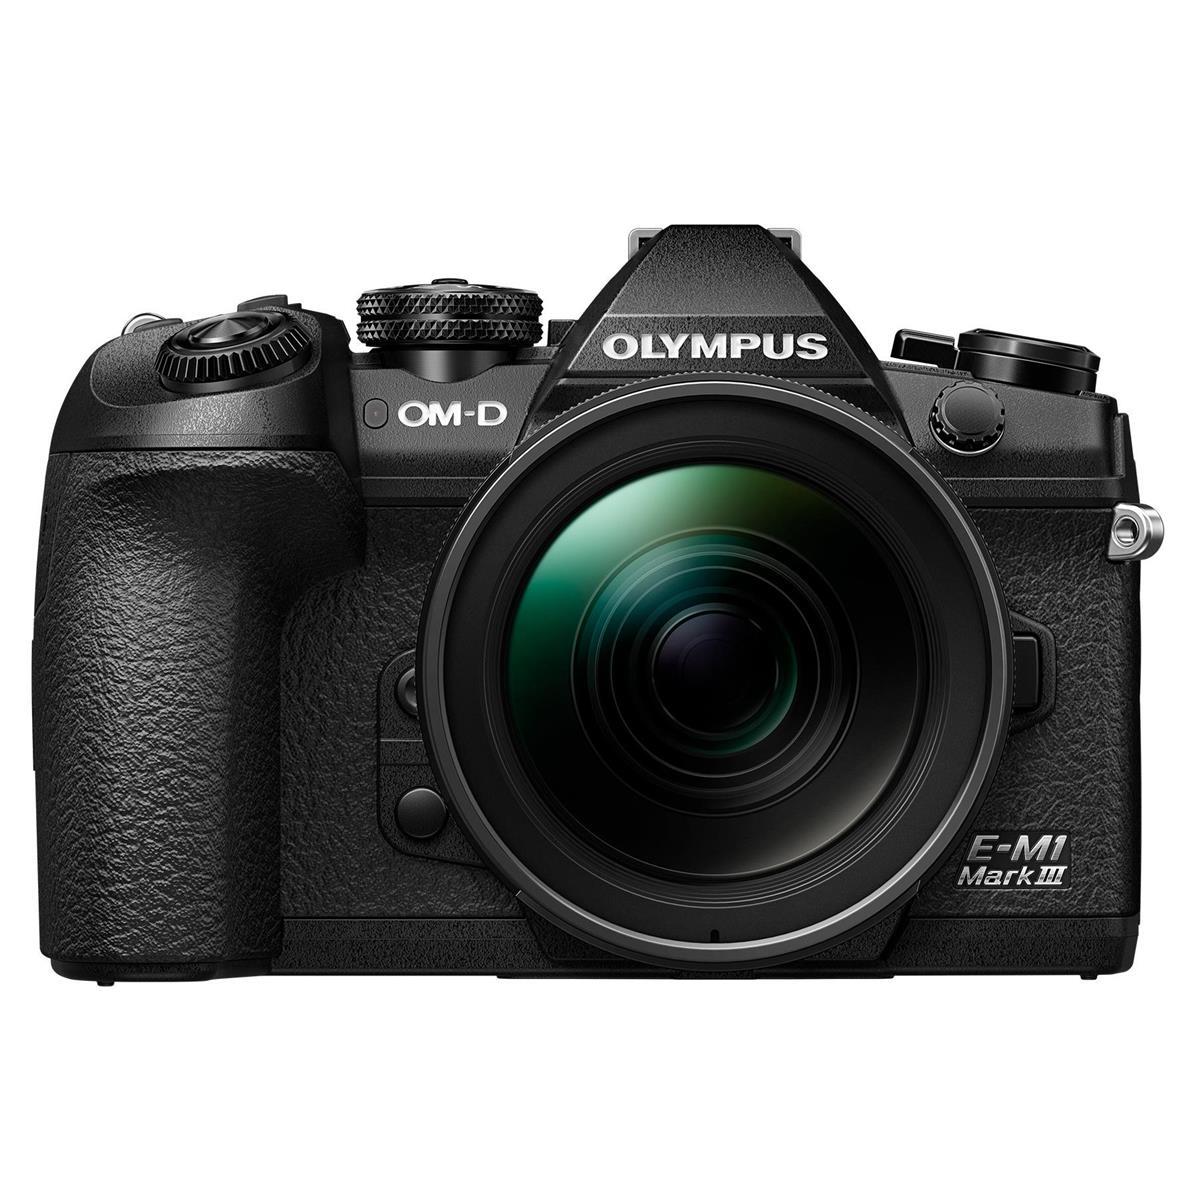 (open box) Olympus OM-D E-M1 Mark III Mirrorless Digital Camera with M.Zuiko Digital ED 12-100mm f/4 IS PRO Lens $2199 + free s.g at Adorama